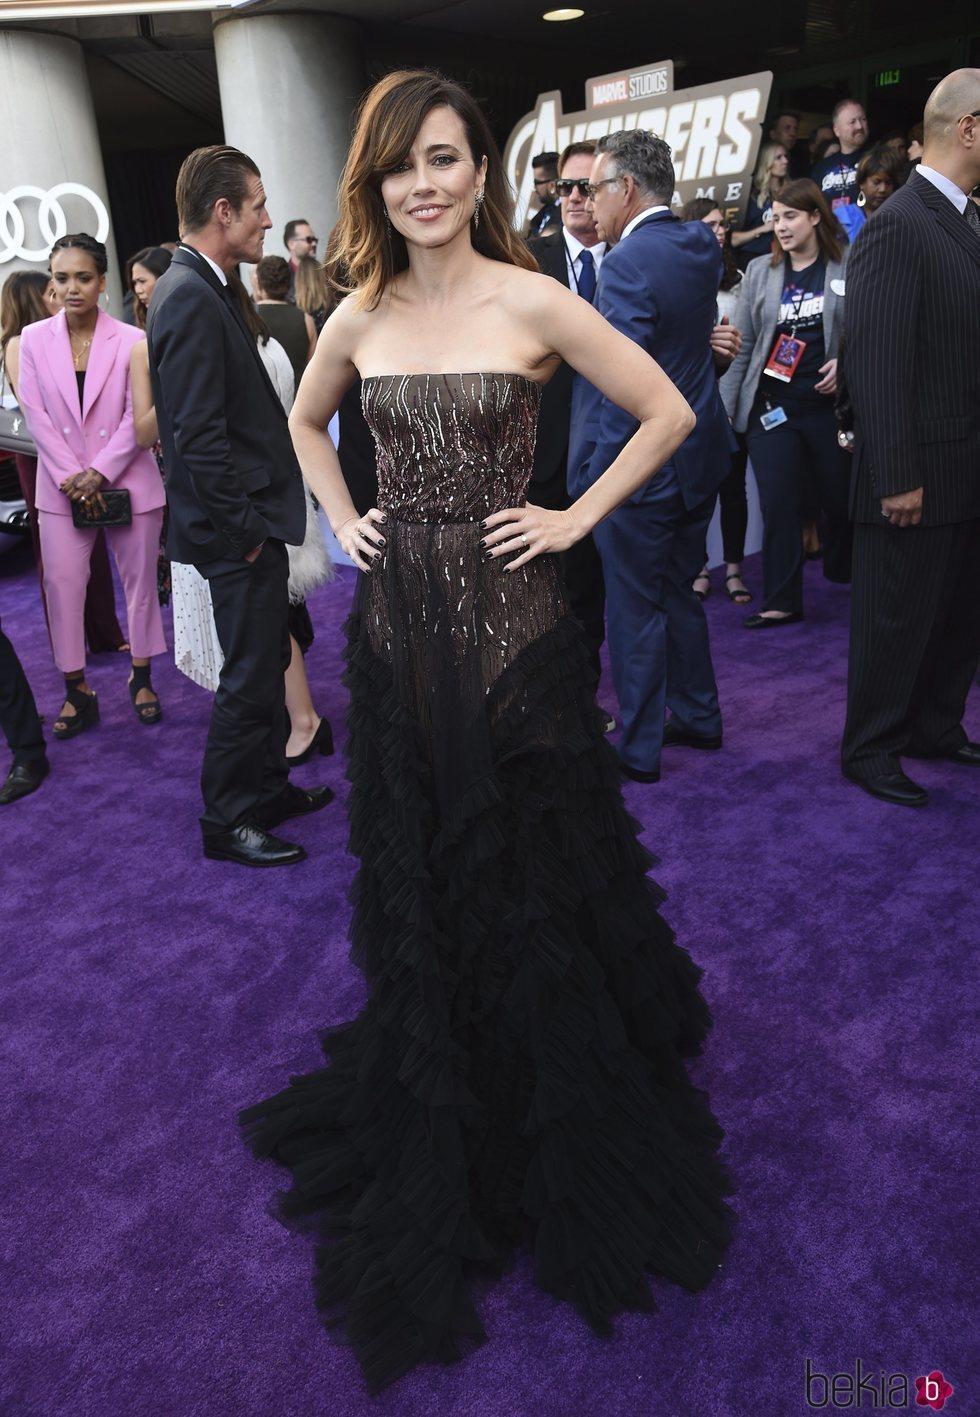 Linda Cardellini en la premiere de 'Vengadores: Endgame'